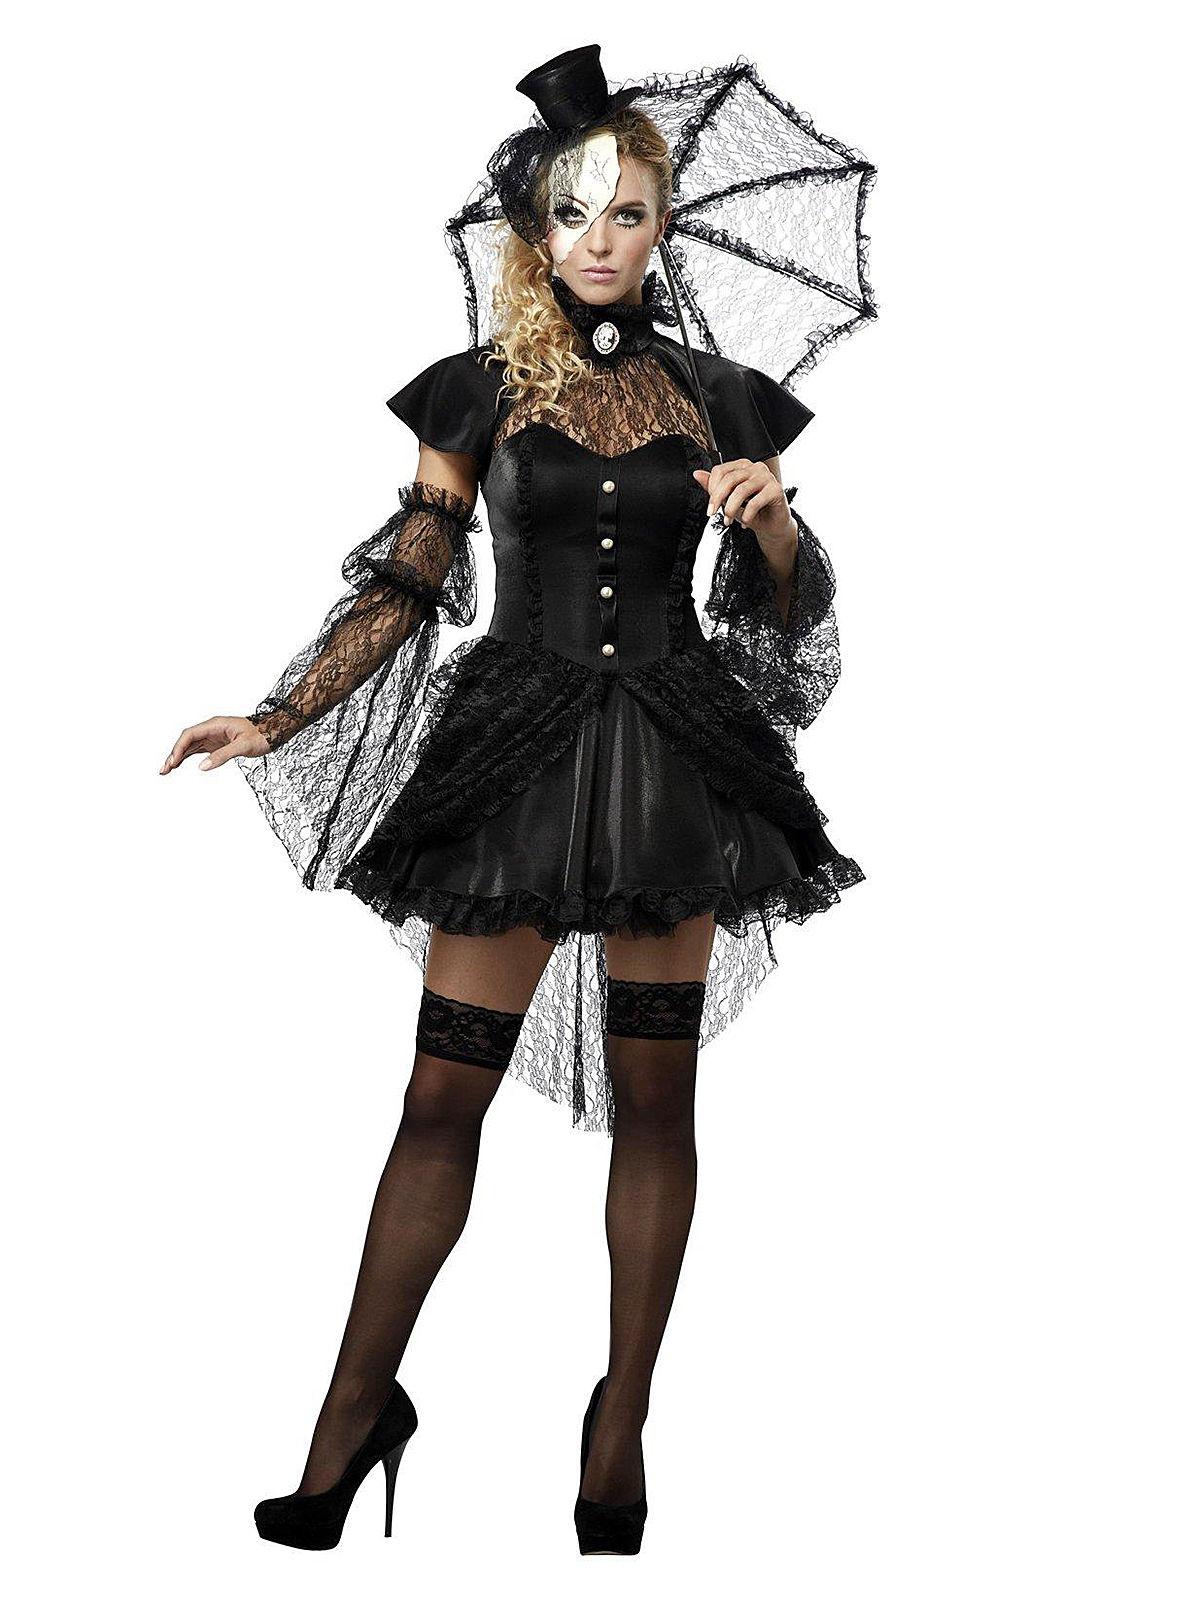 Halloween Kostüm Damen Günstig Best Of Gothic Puppe Halloween Damen Kostüm Kostüme Für